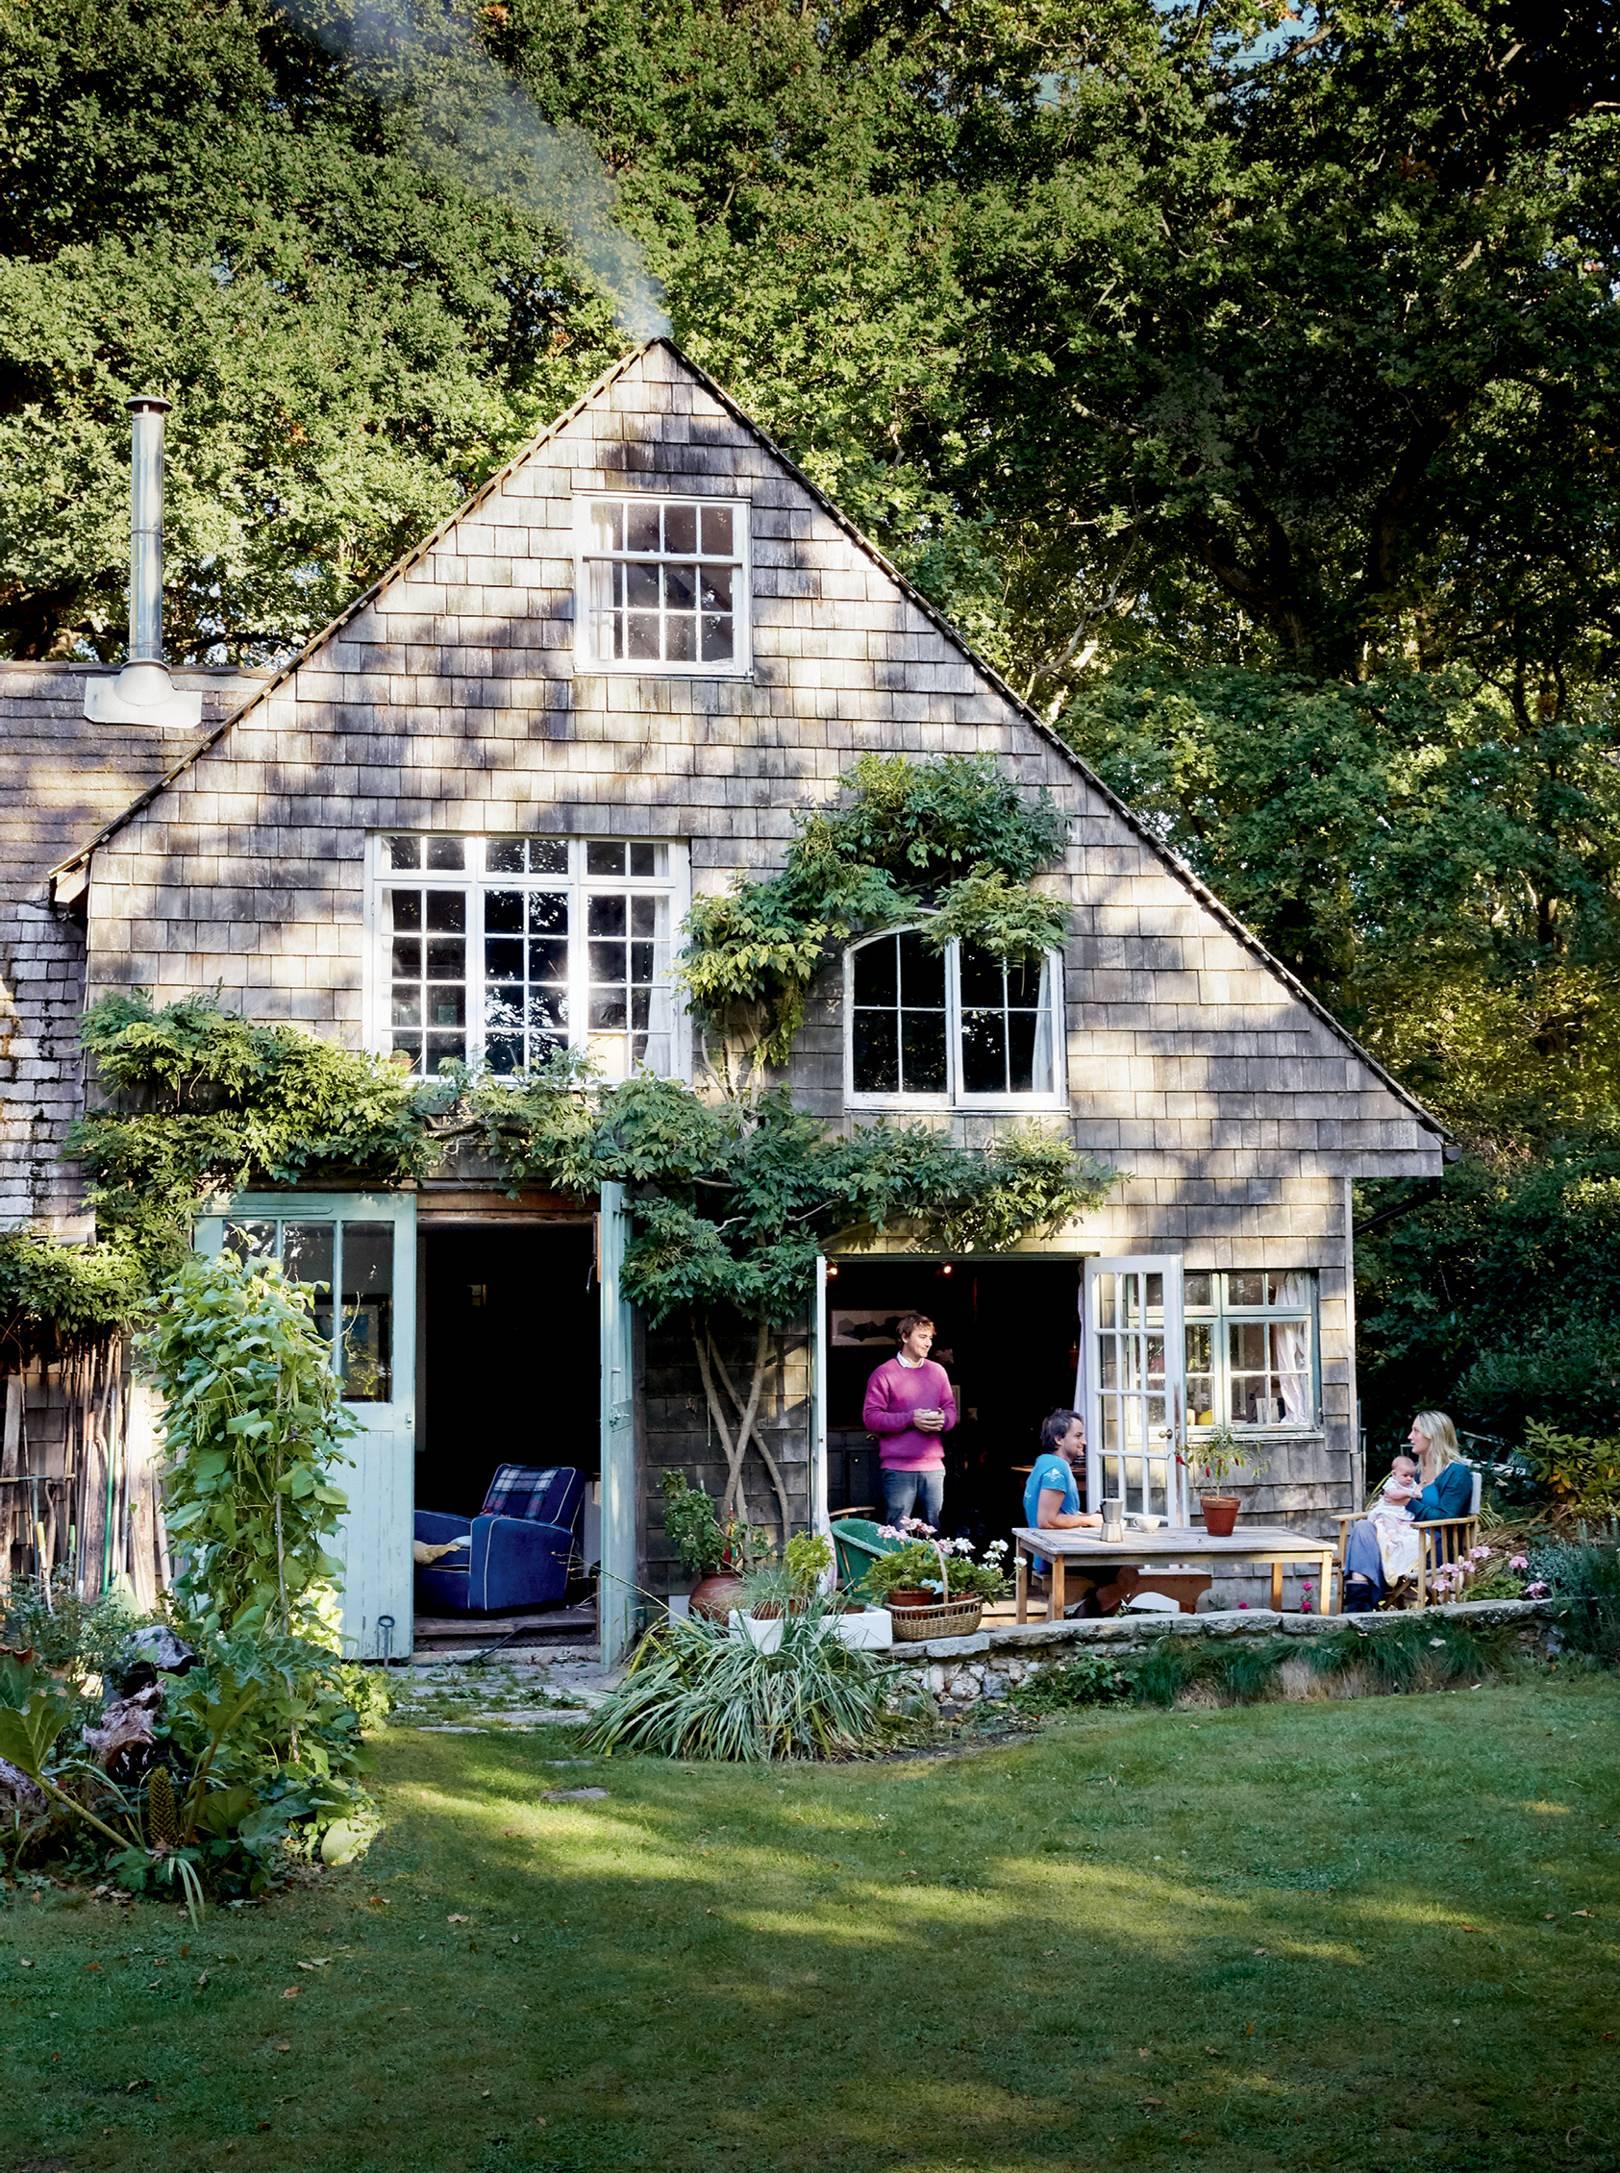 The idyllic coastal house of an expert furniture maker